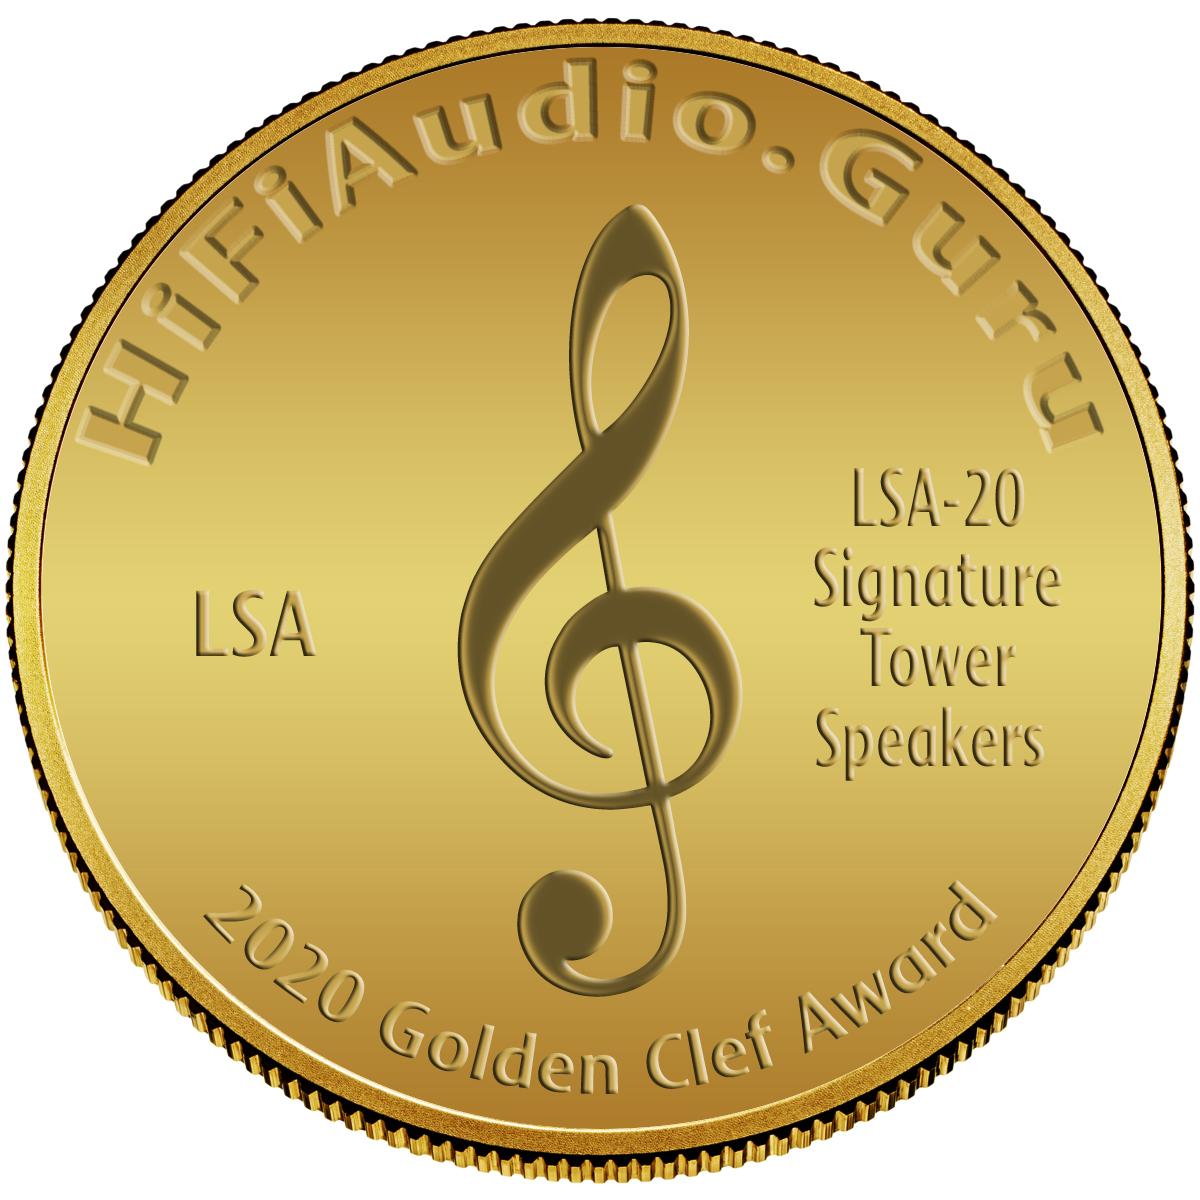 LSA (Living Sounds Audio) LSA 20 Signature Tower Speakers